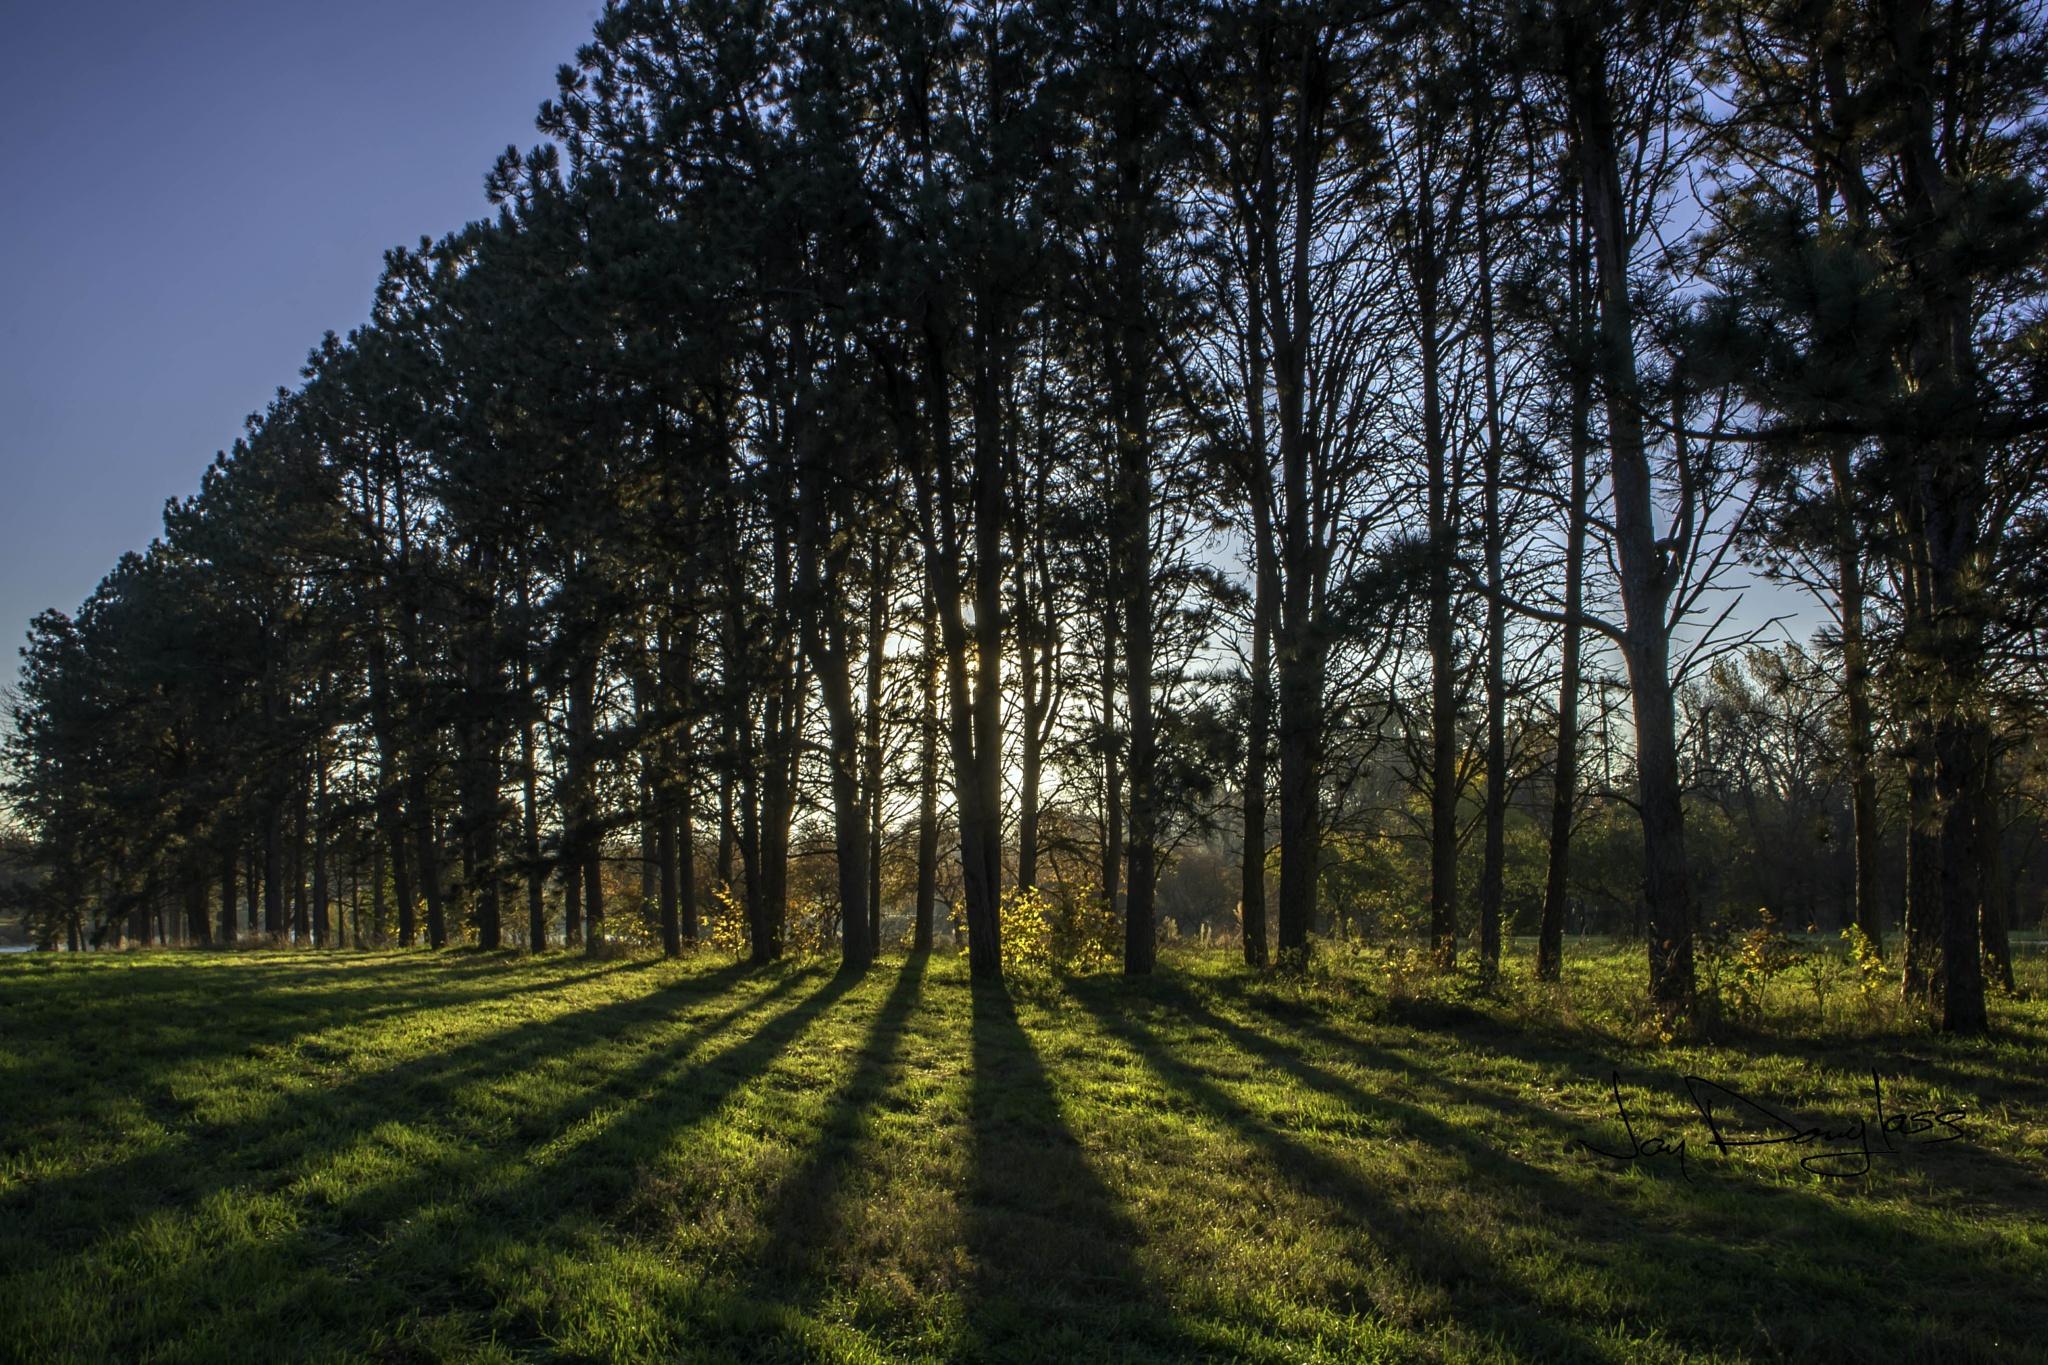 Morning Shadows by Jay Douglass